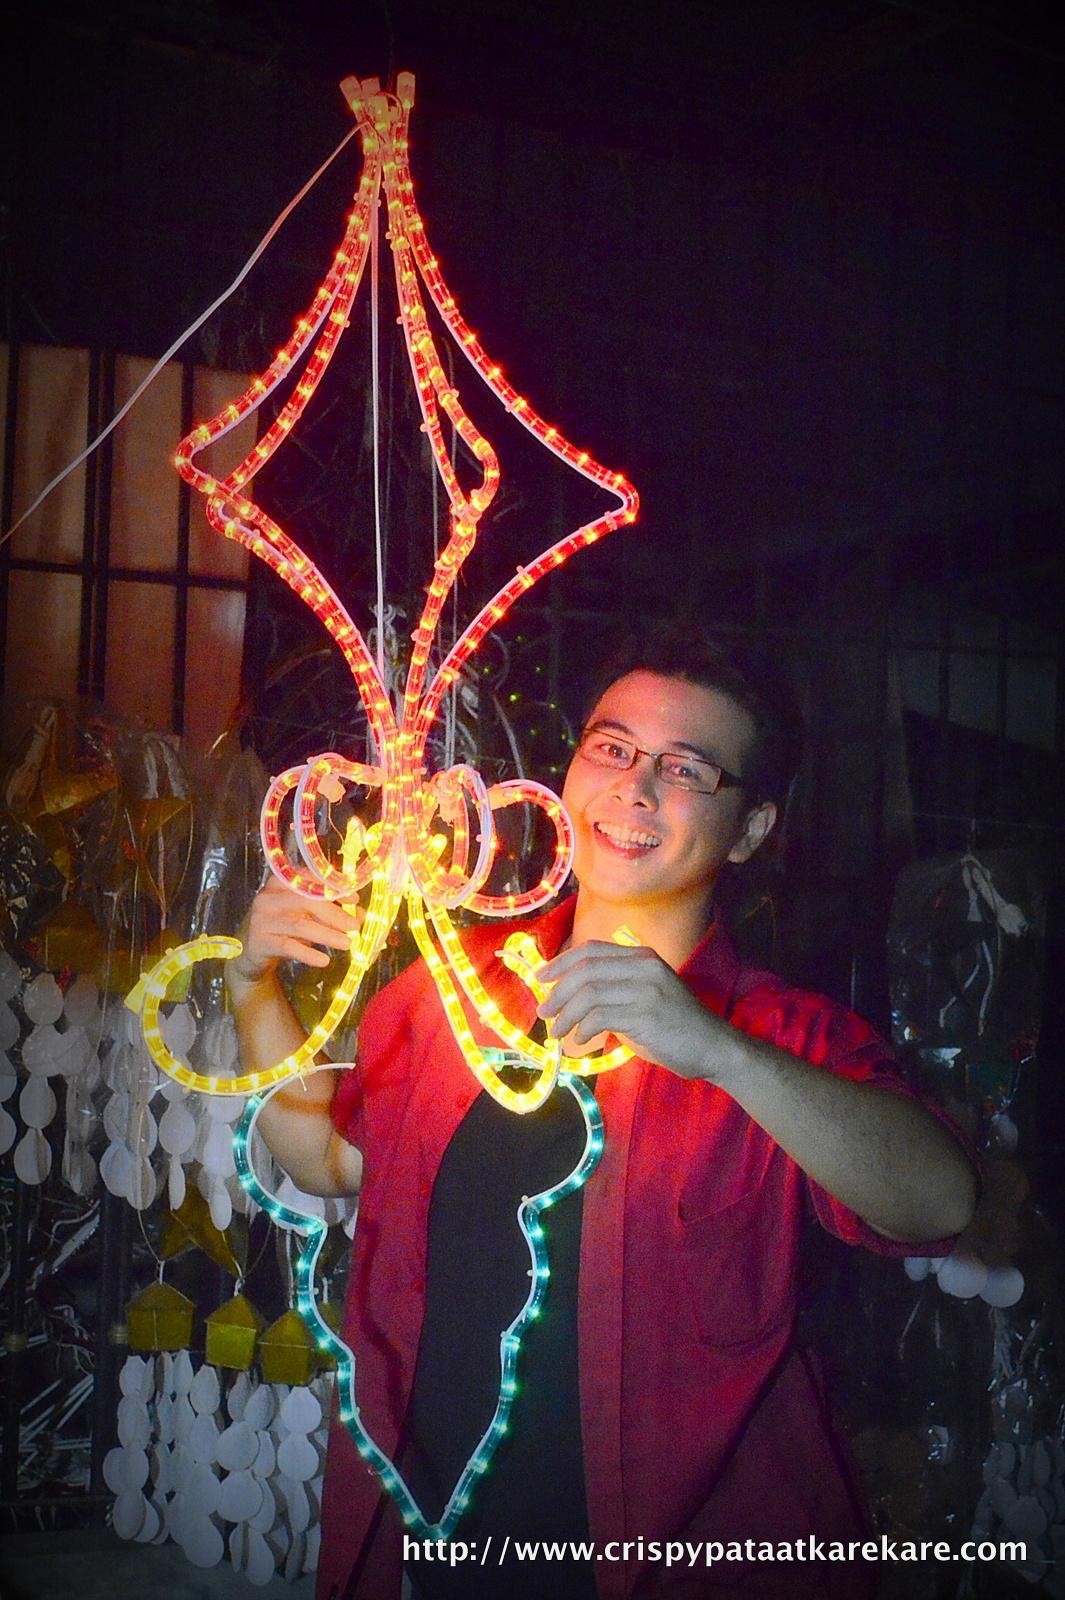 RolRen's Lanterns and General Merchandise   Crispy Pata at